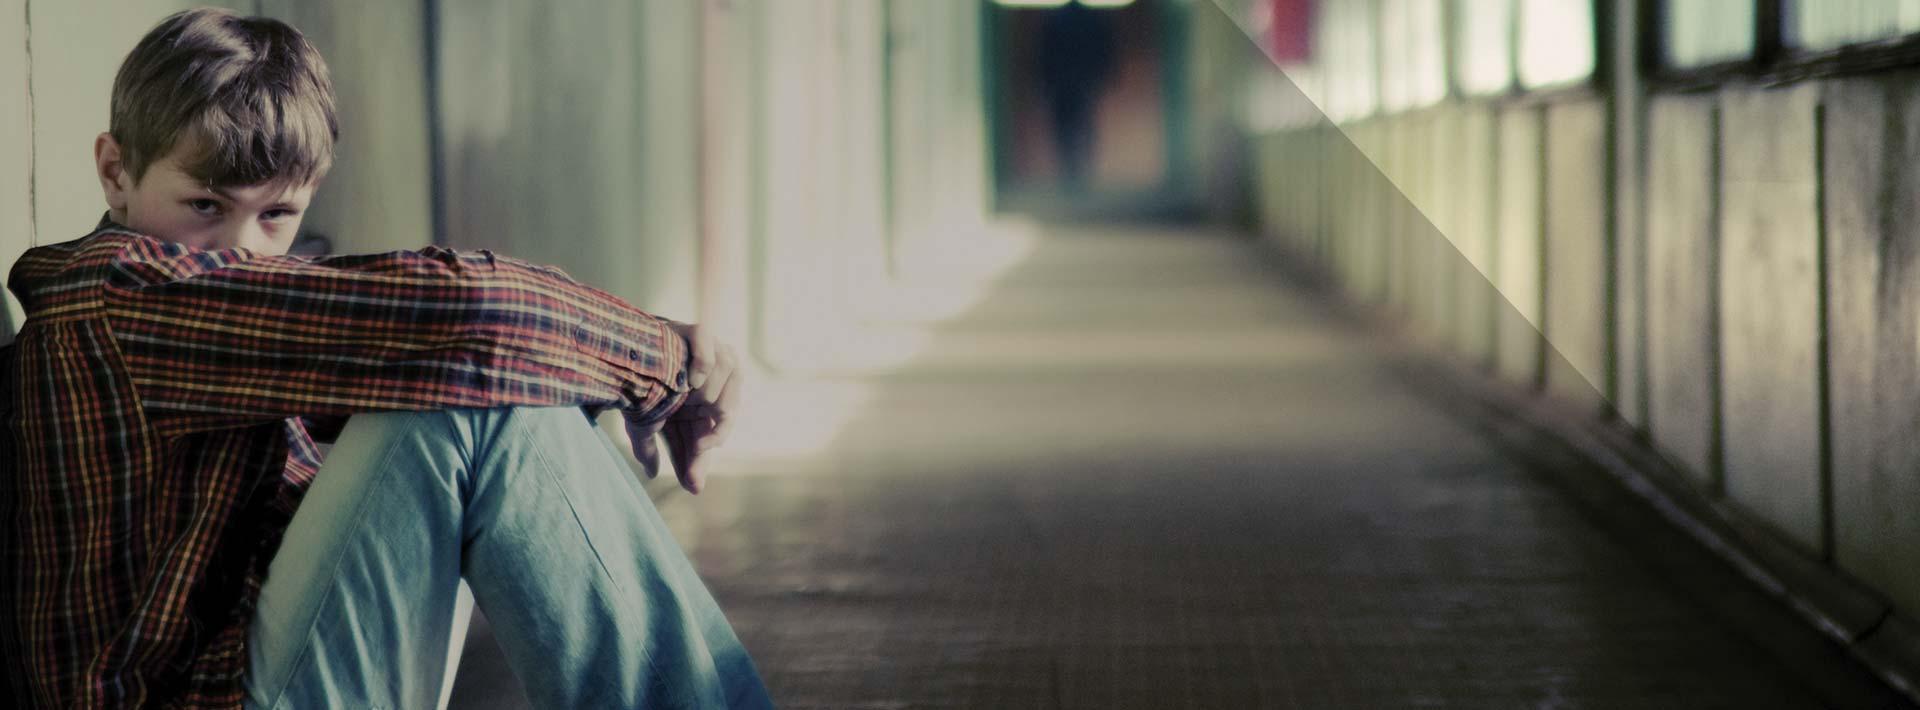 Child sitting alone in an empty corridor